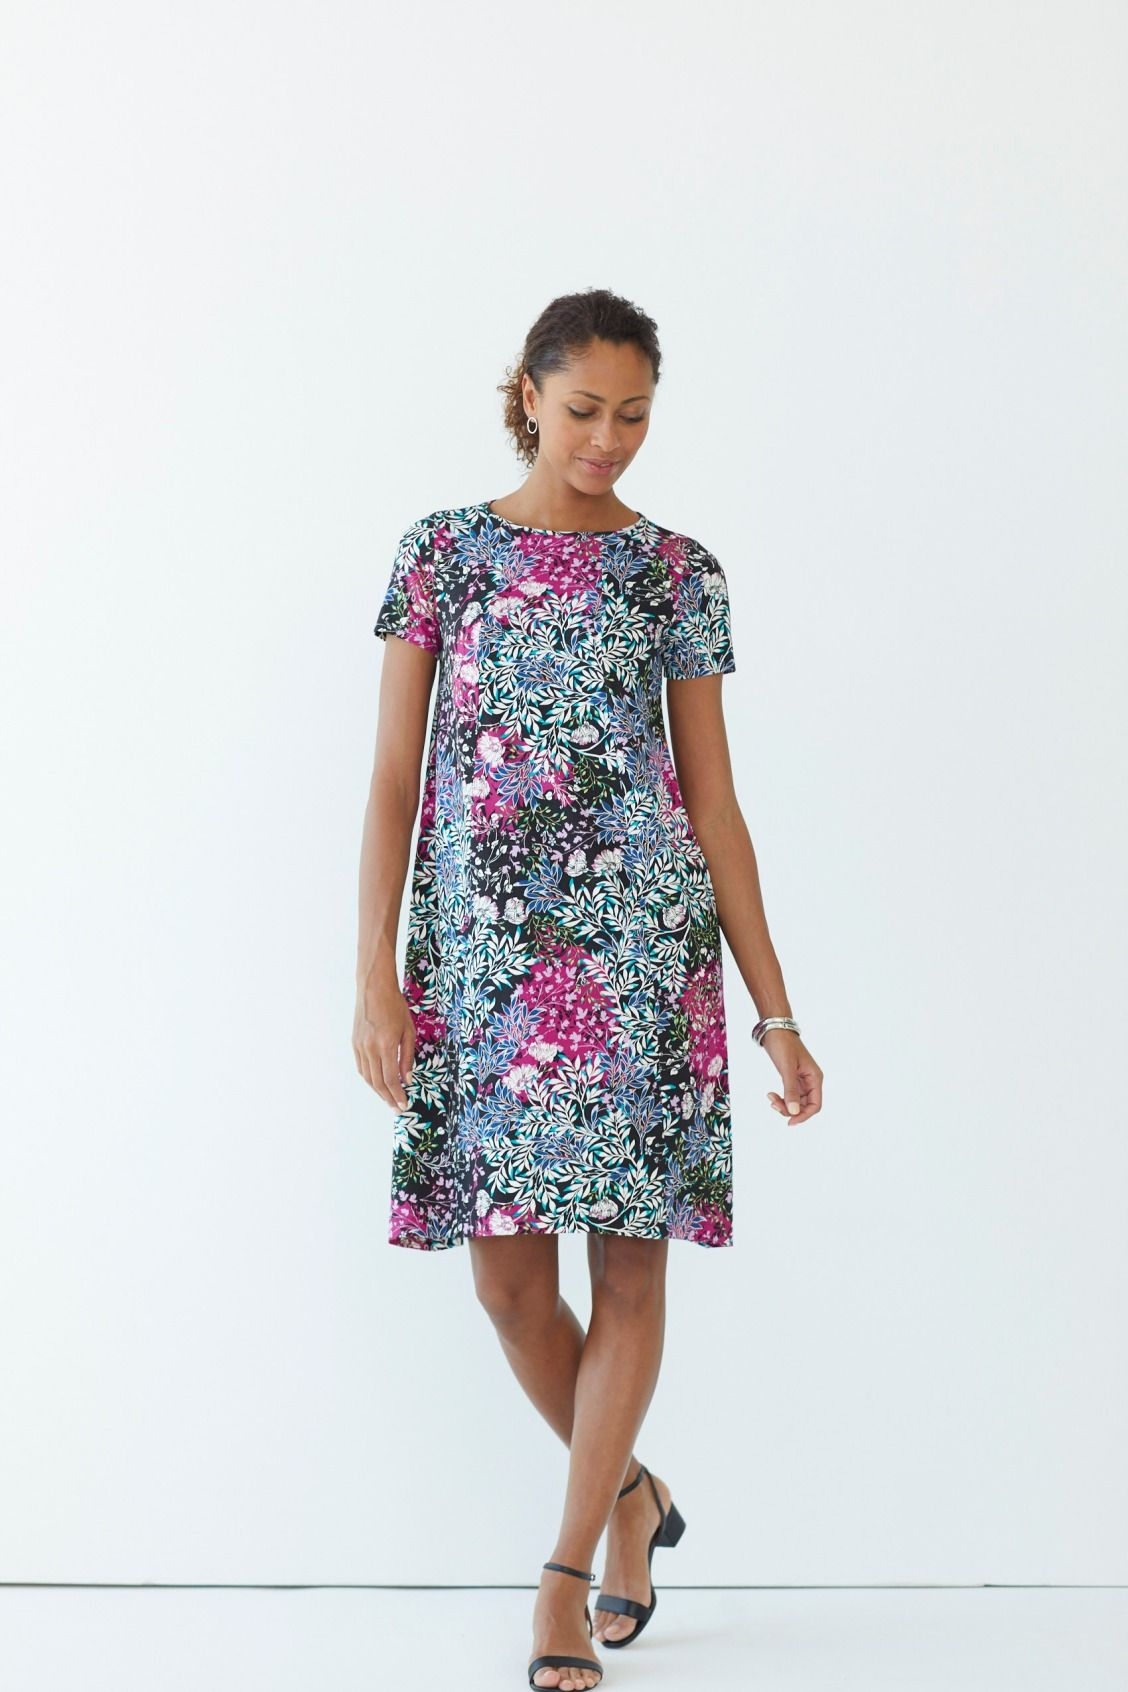 90cc84517d Summer s finest florals (featuring J.Jill s Wearever Swing Dress) Spring  Into Action